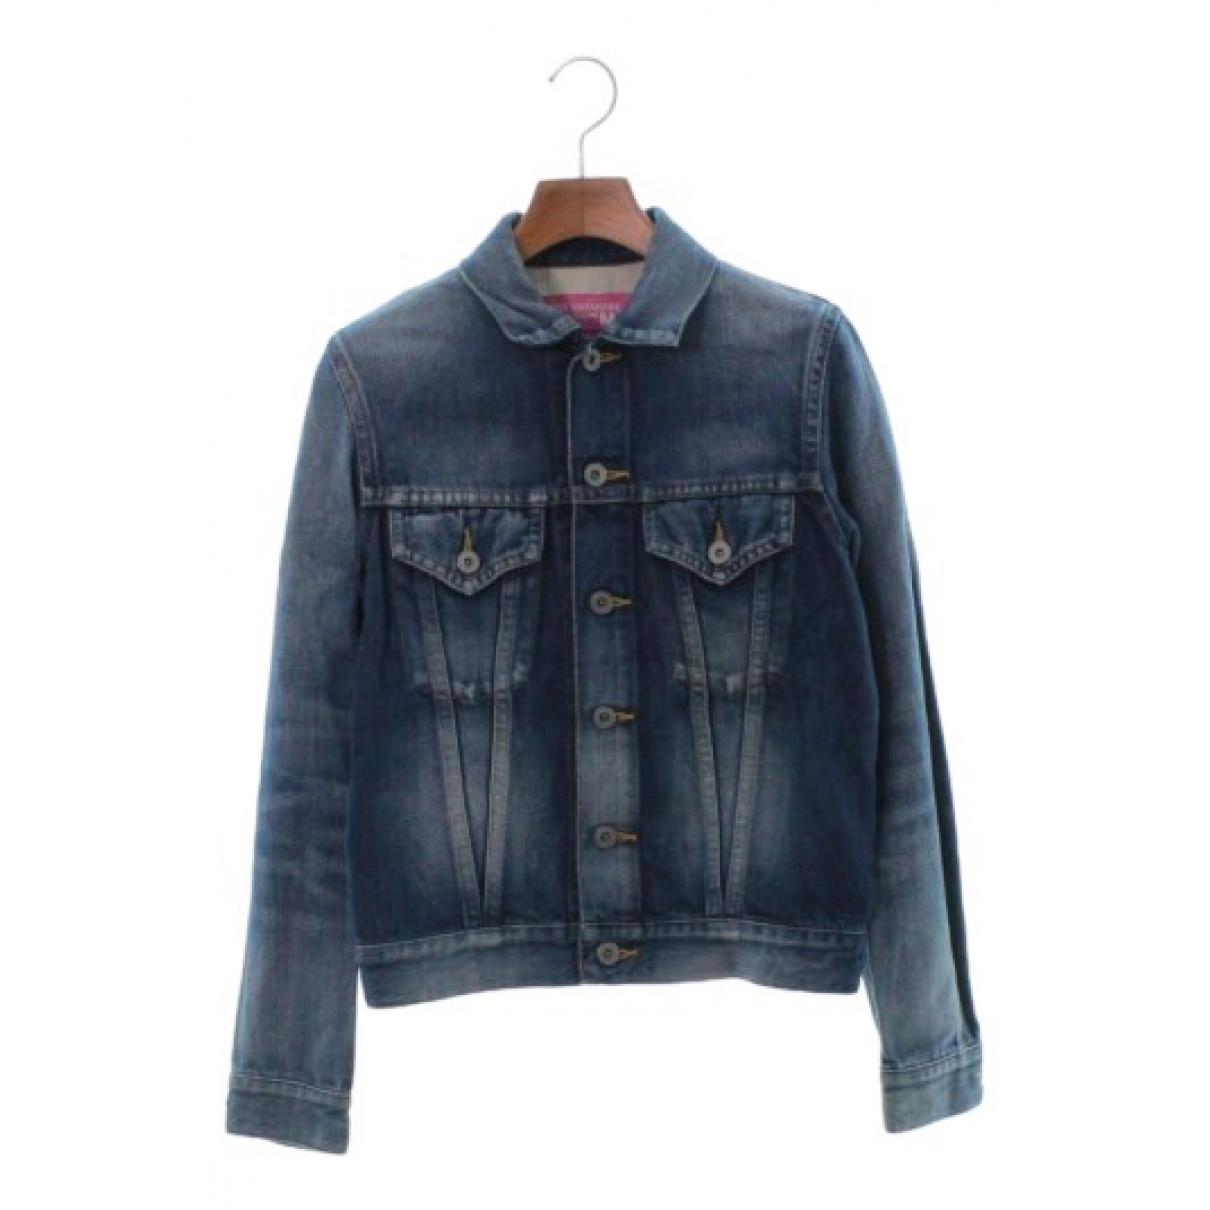 Junya Watanabe \N Jacke in  Blau Denim - Jeans